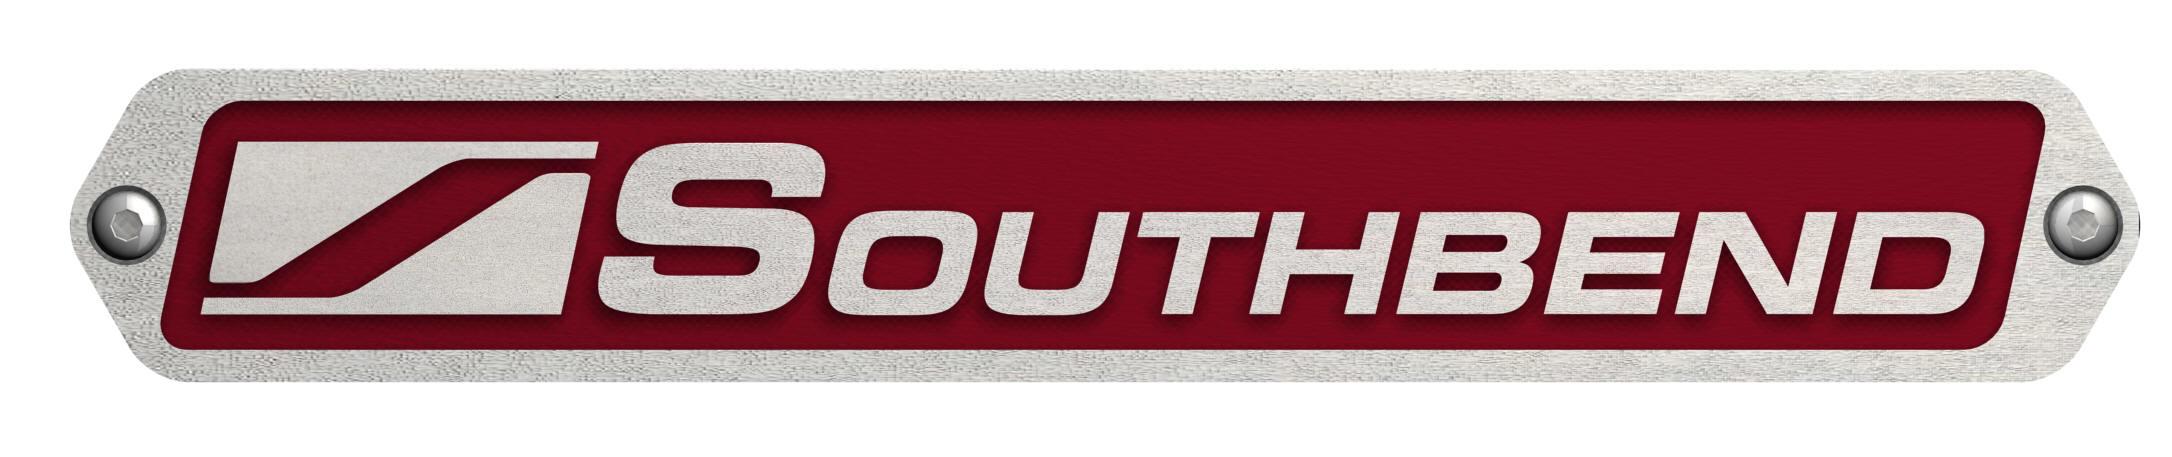 Image result for southbend logo